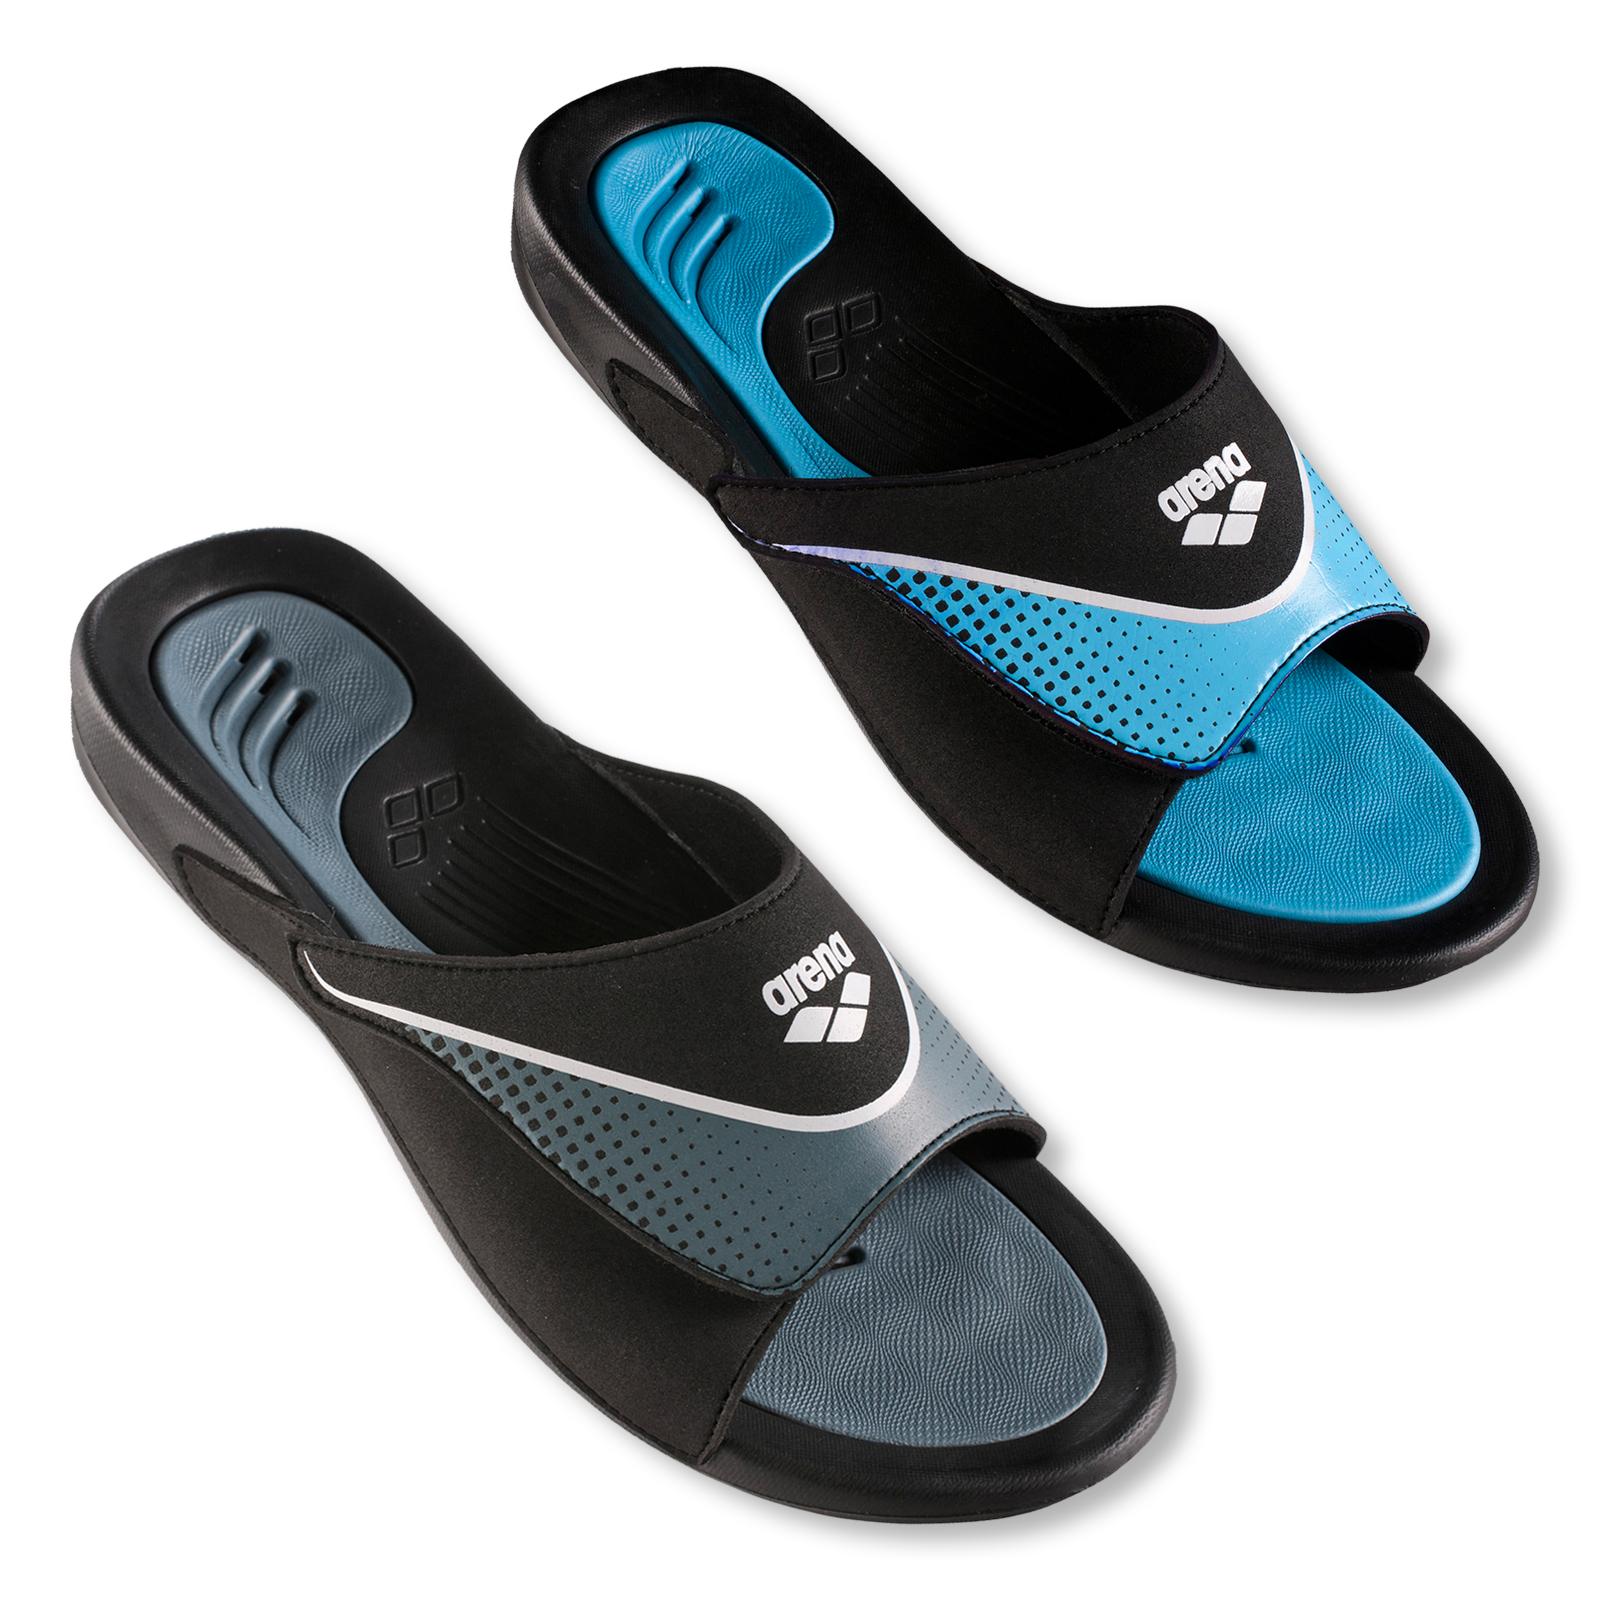 Arena Herren Poolsandale Hydrofit Velcro 40 41 42 43 44 45 46 47 48 in black / grey / white